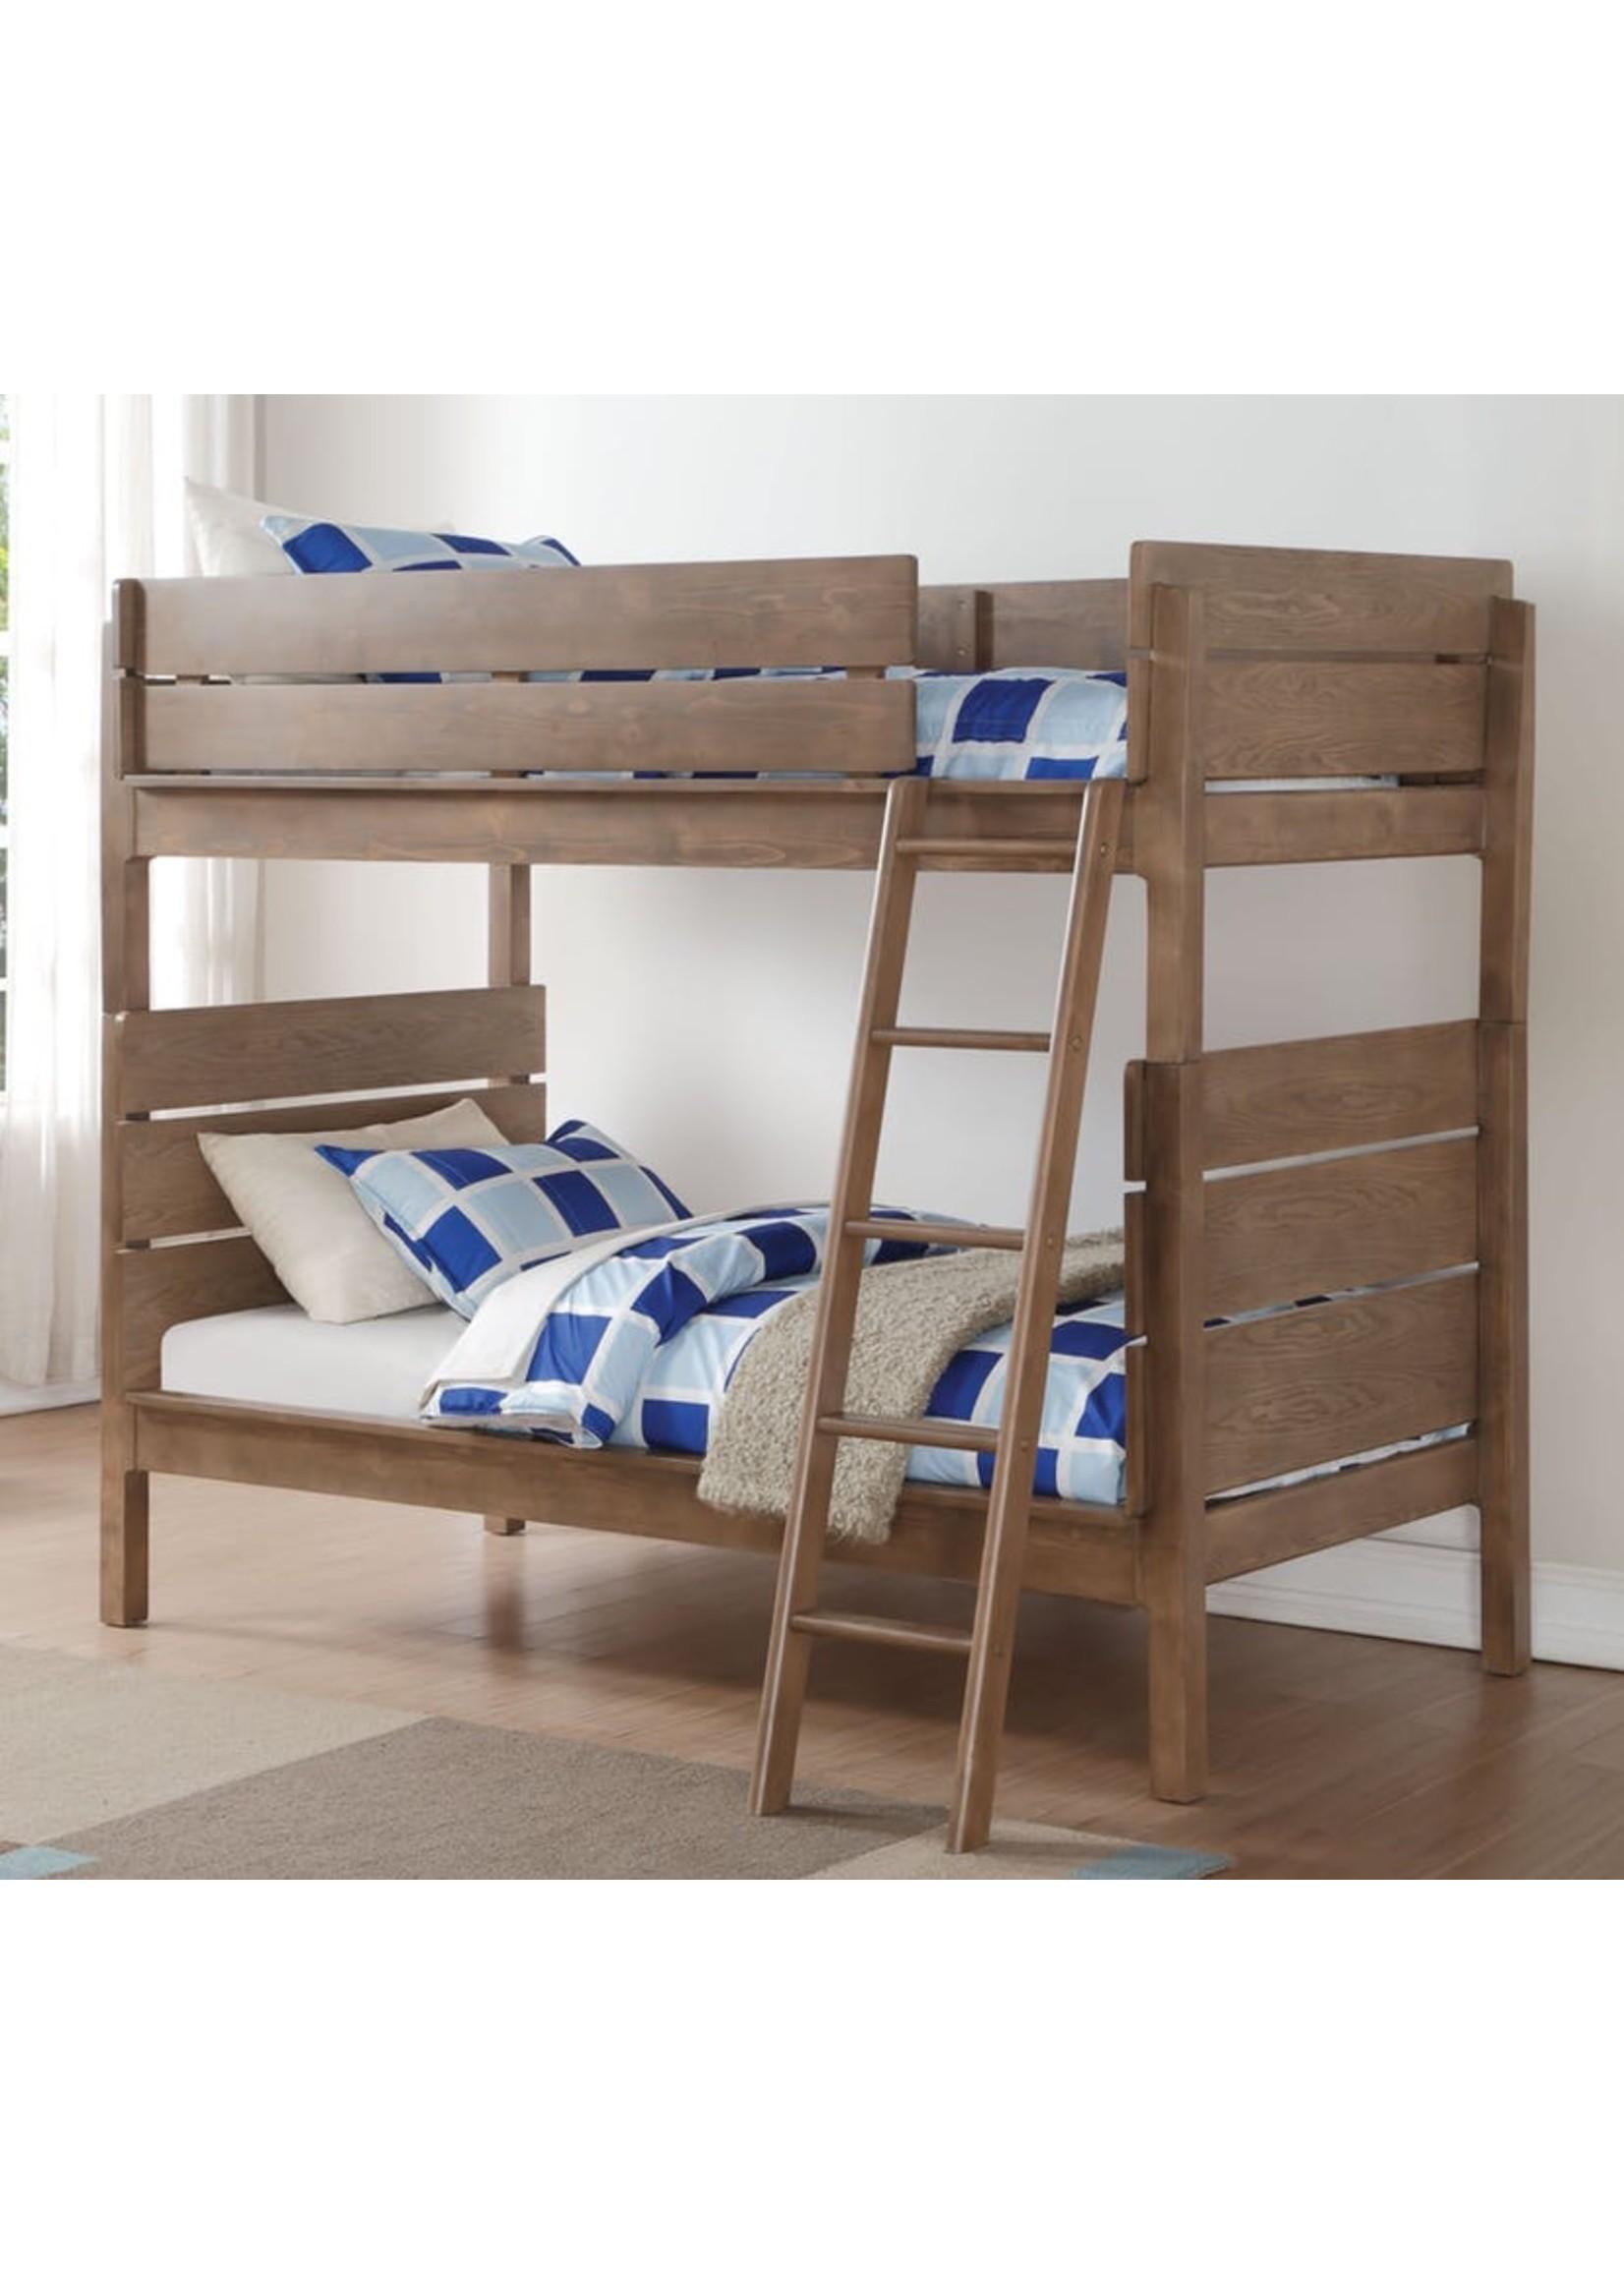 ACME RANTA BUNK BED IN ANTIQUE OAK FINISH